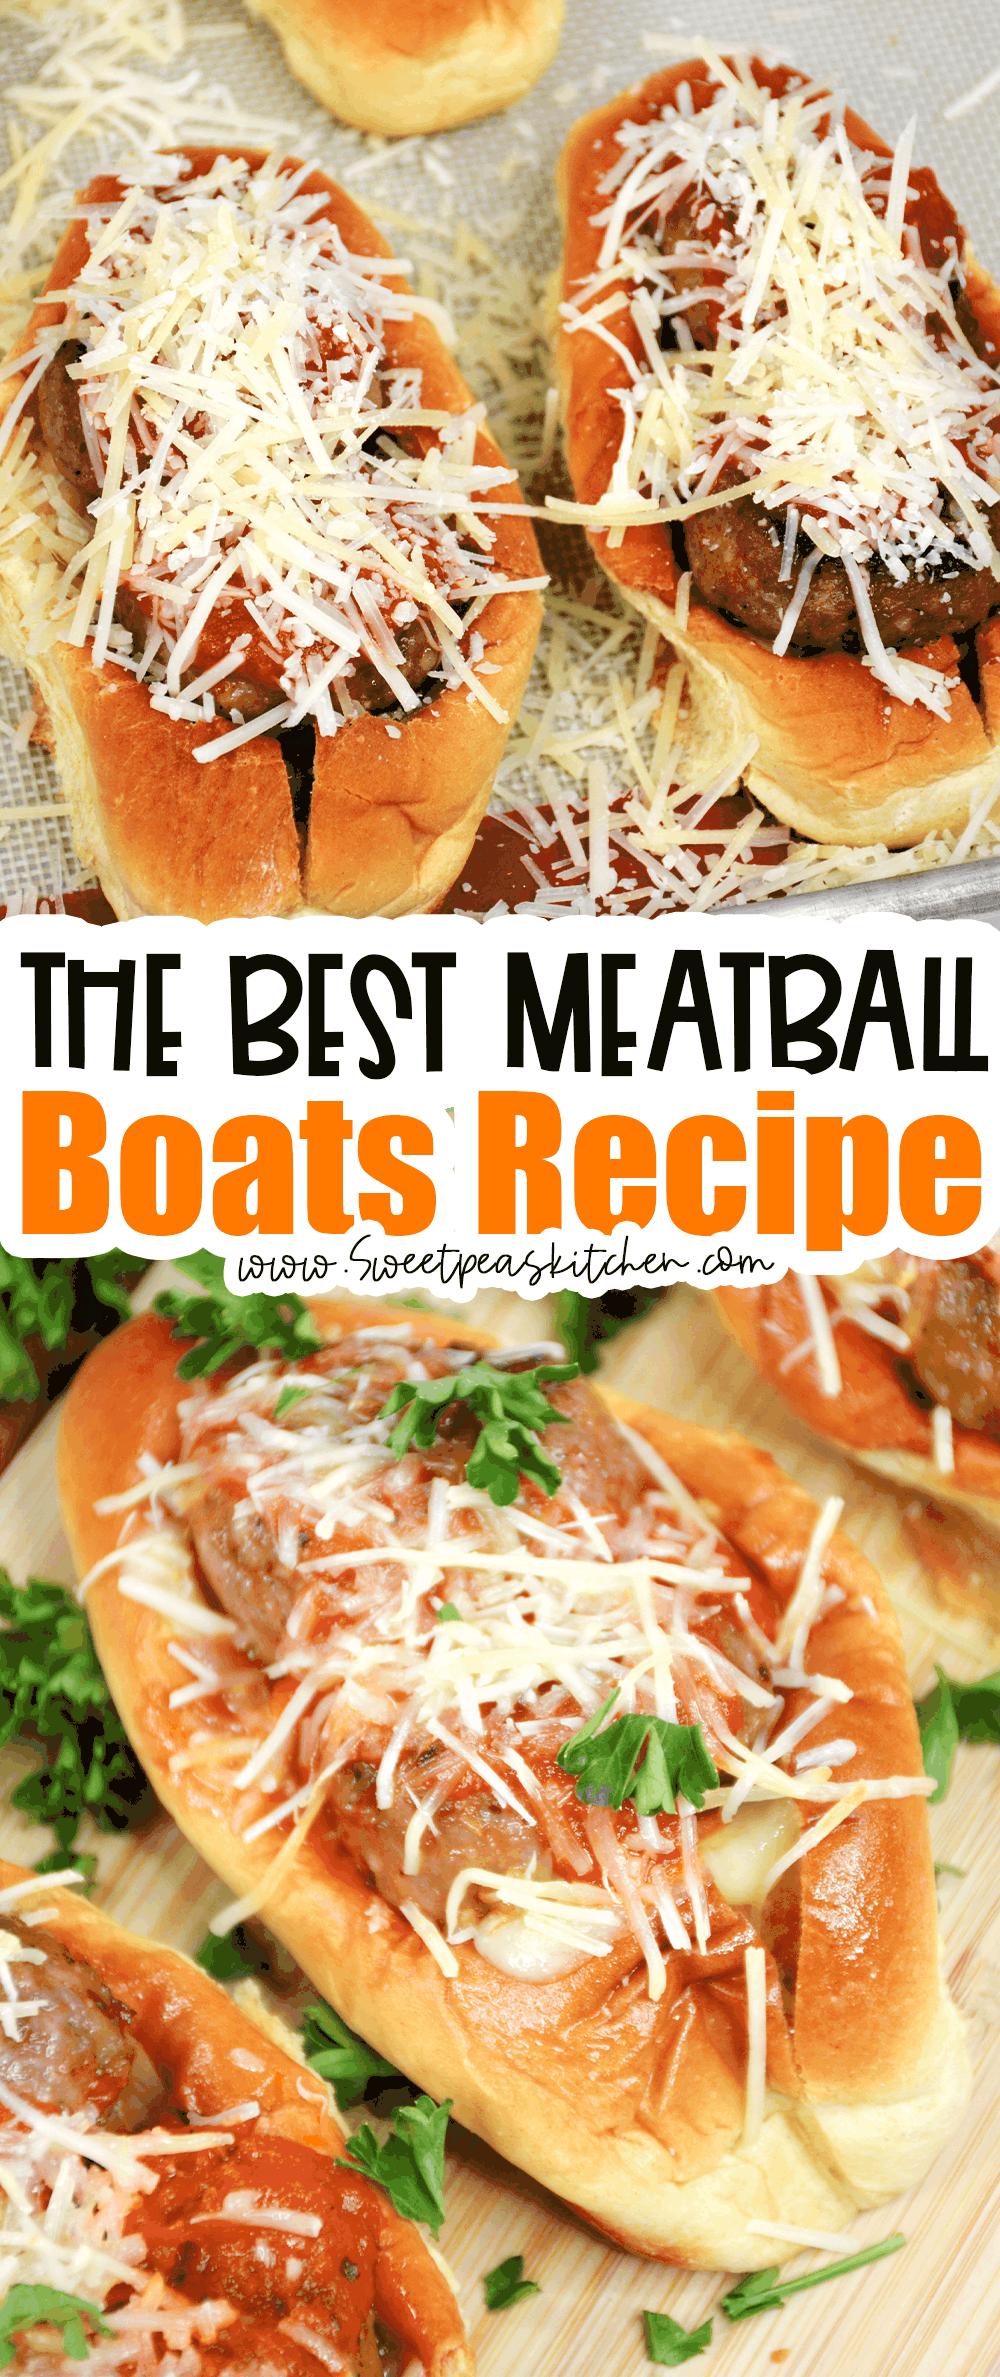 meatball Boats